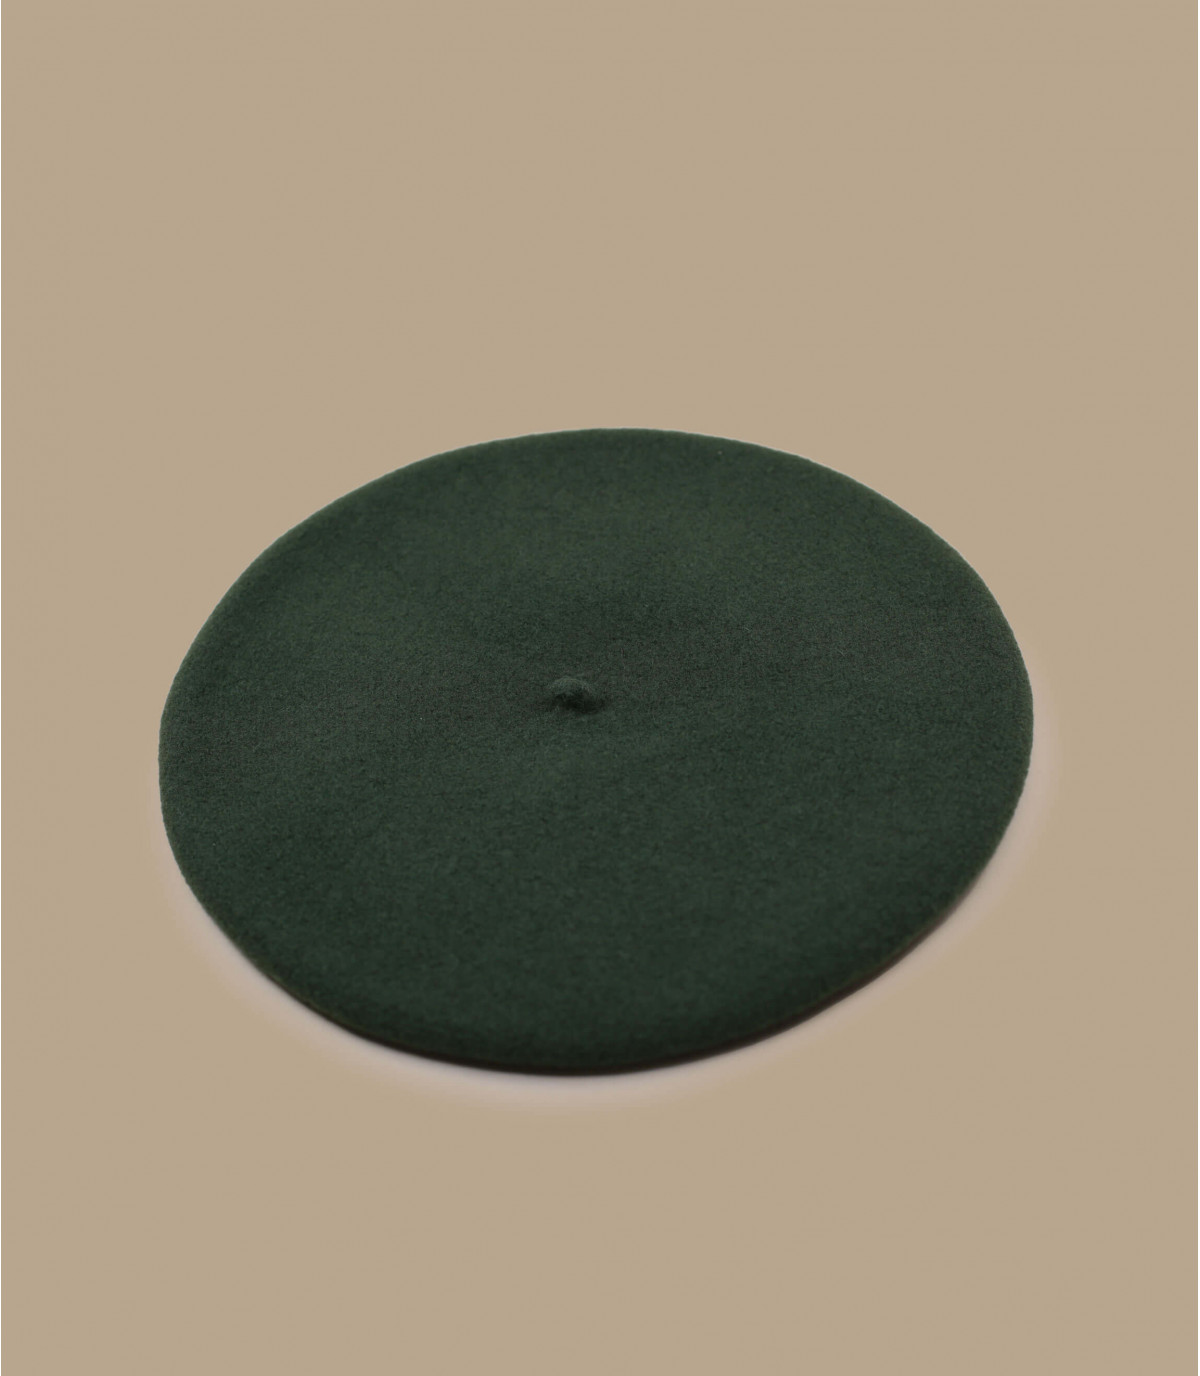 Baskenmütze Wolle khaki grün